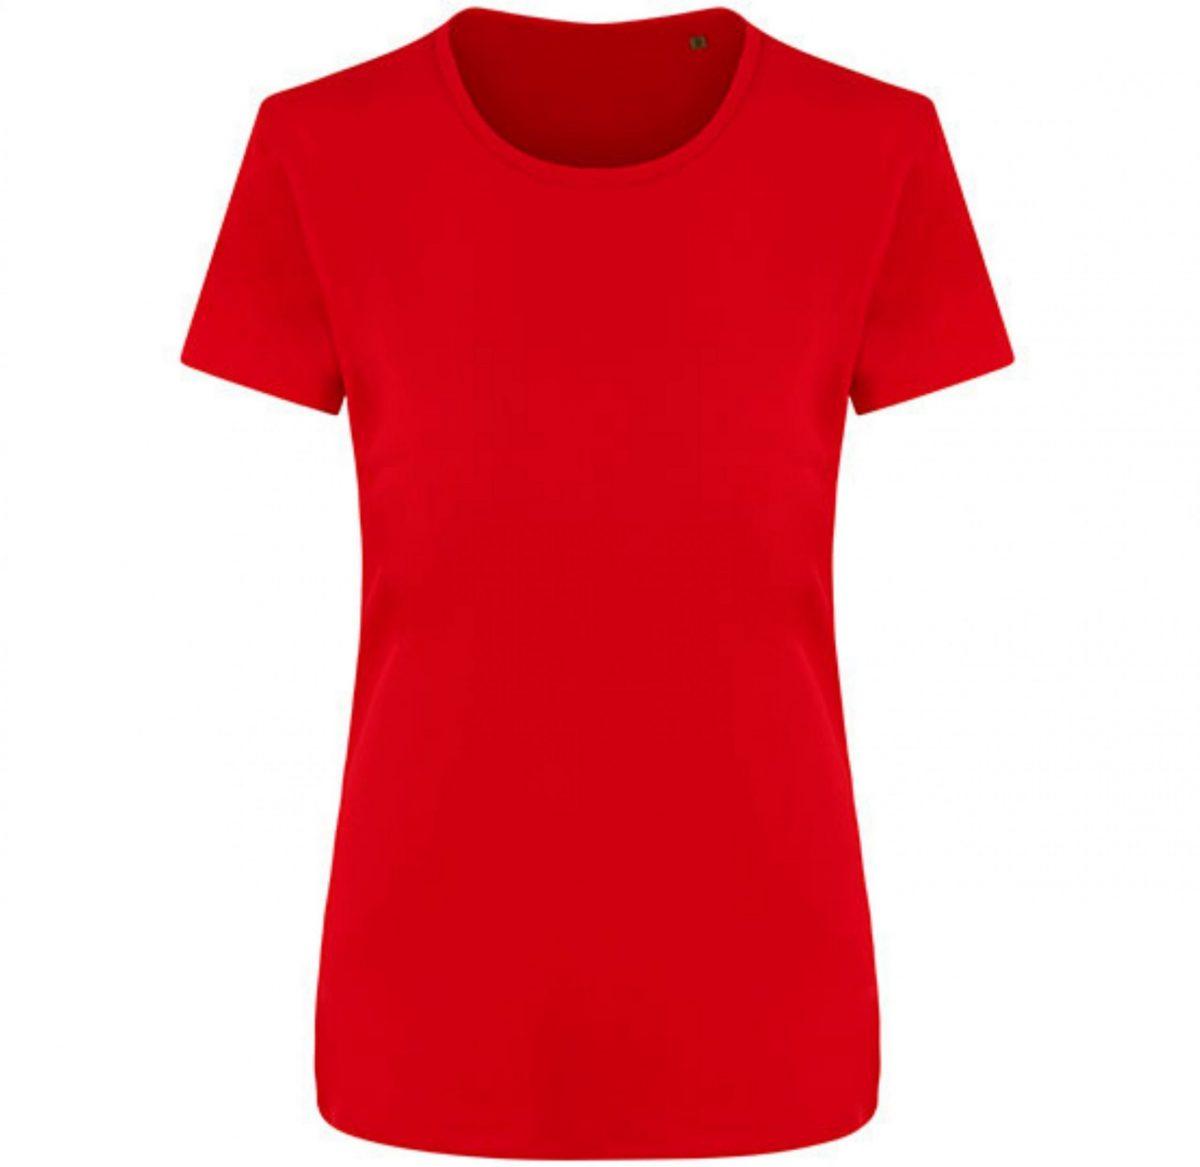 Tee-Shirt Femme Performance – Rouge